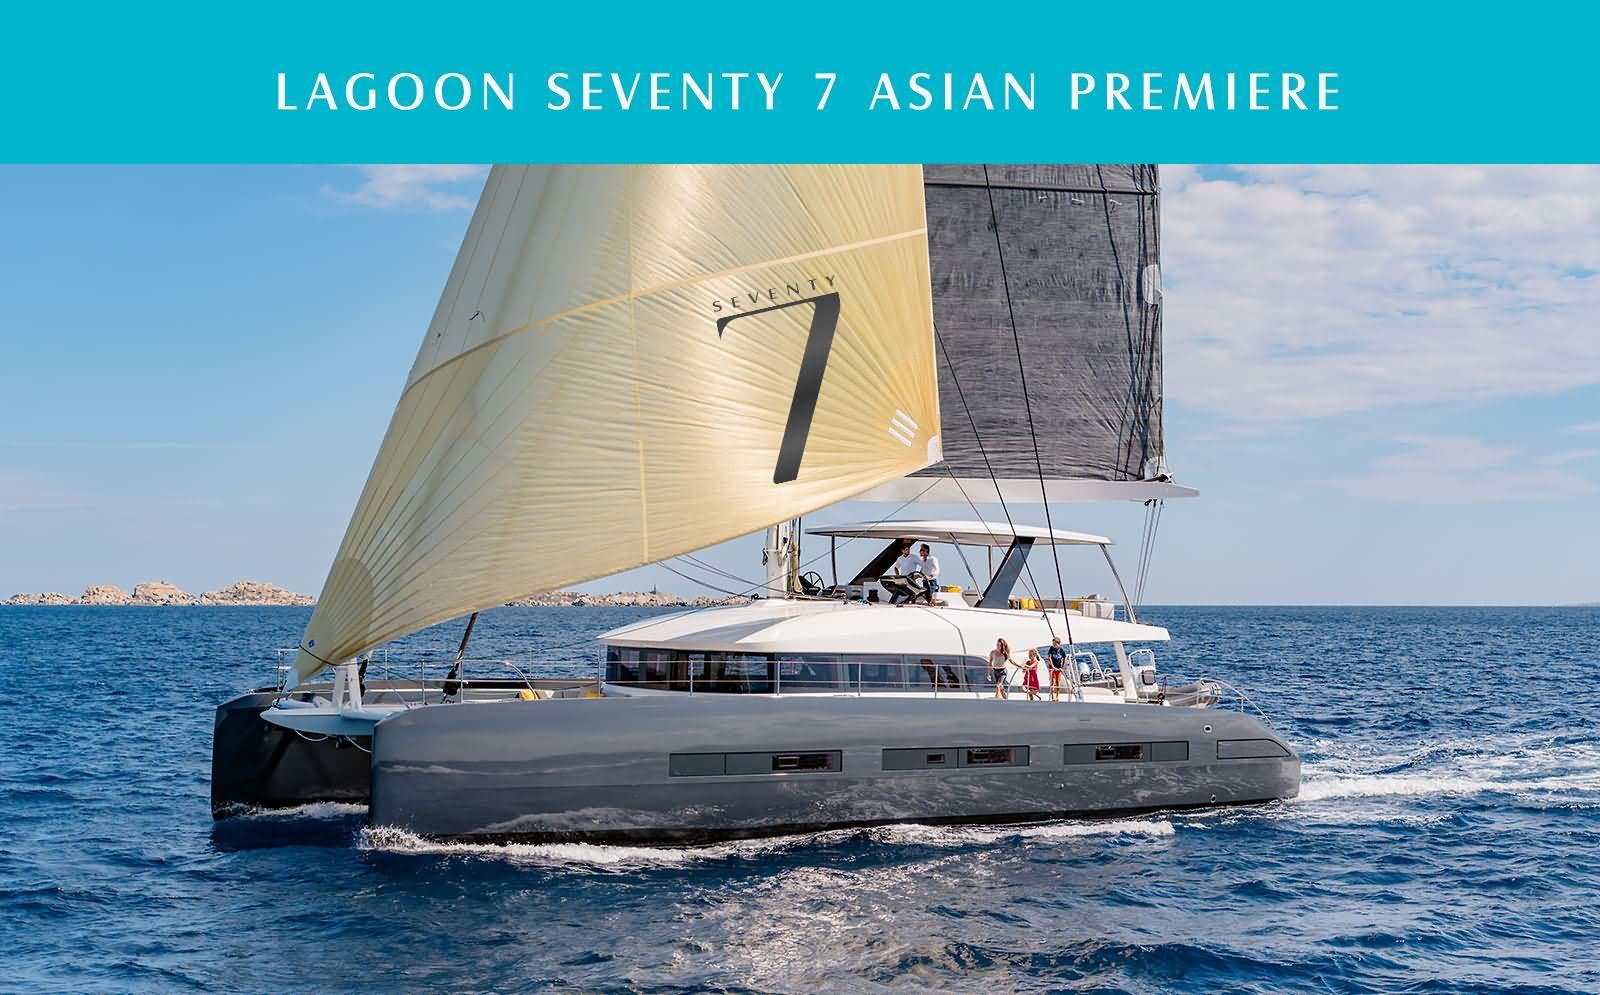 Lagoon Seventy 7 Asian Premiere